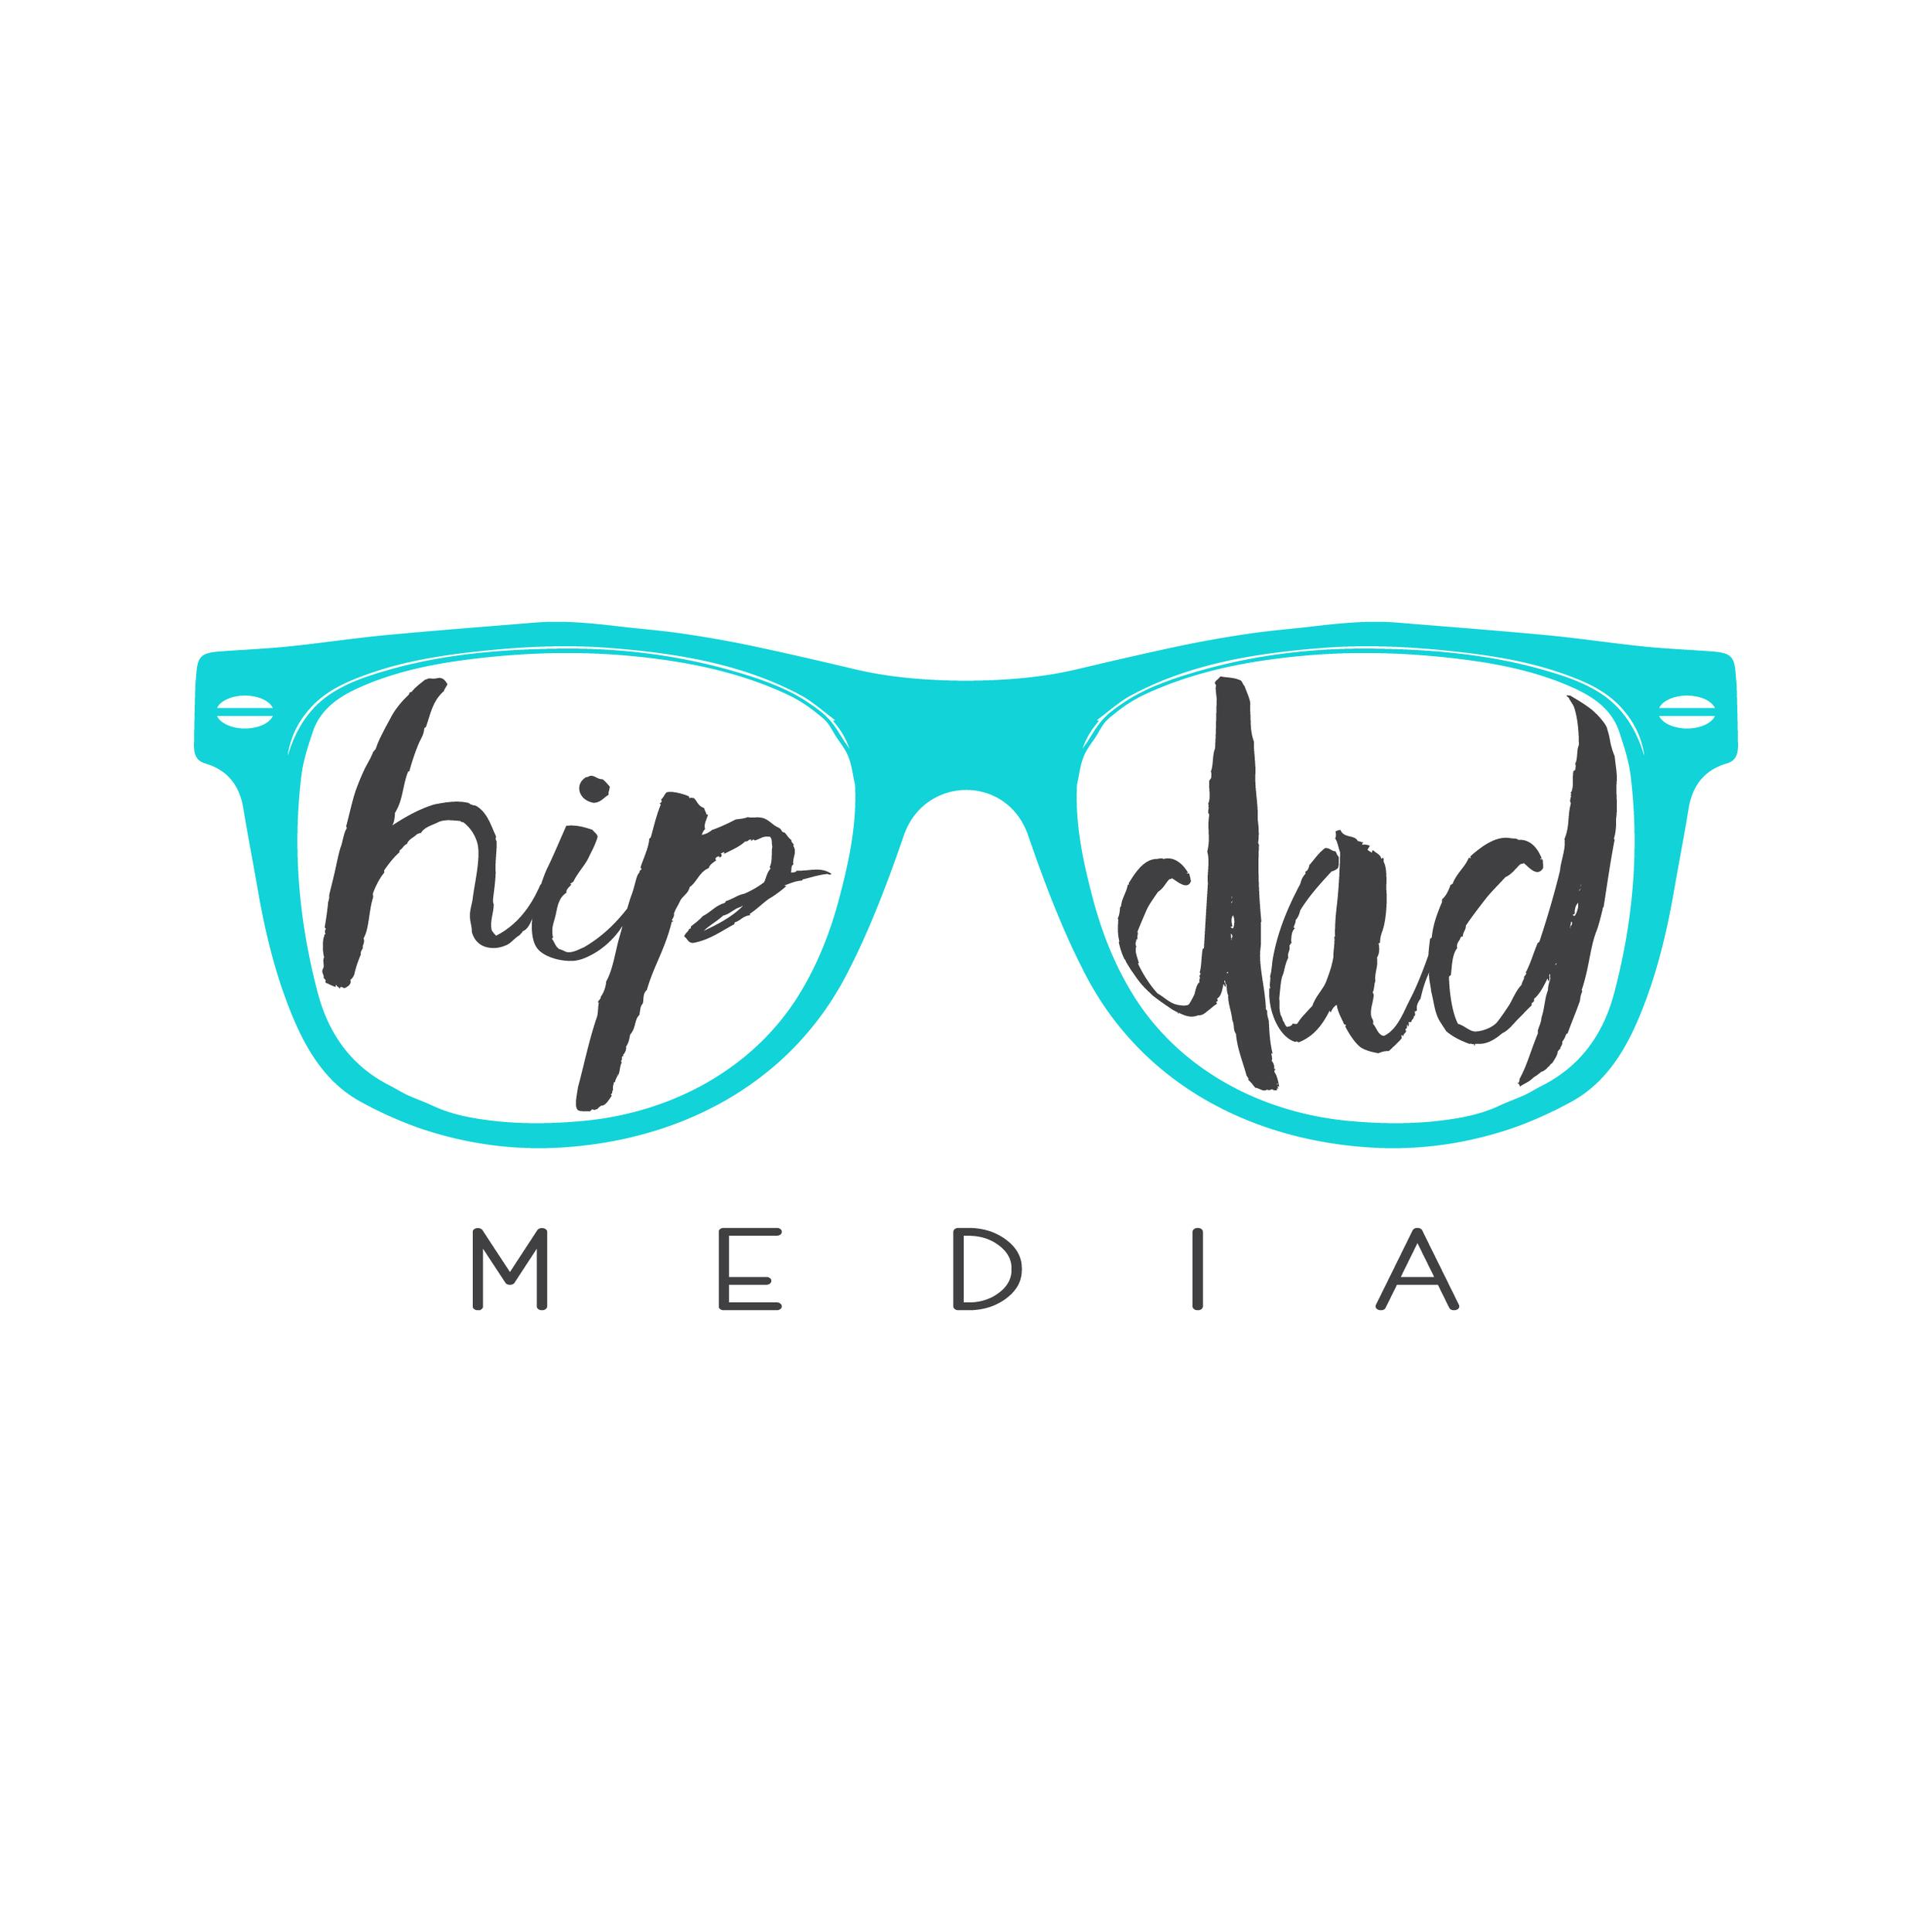 Hip Dad_square-01.jpg